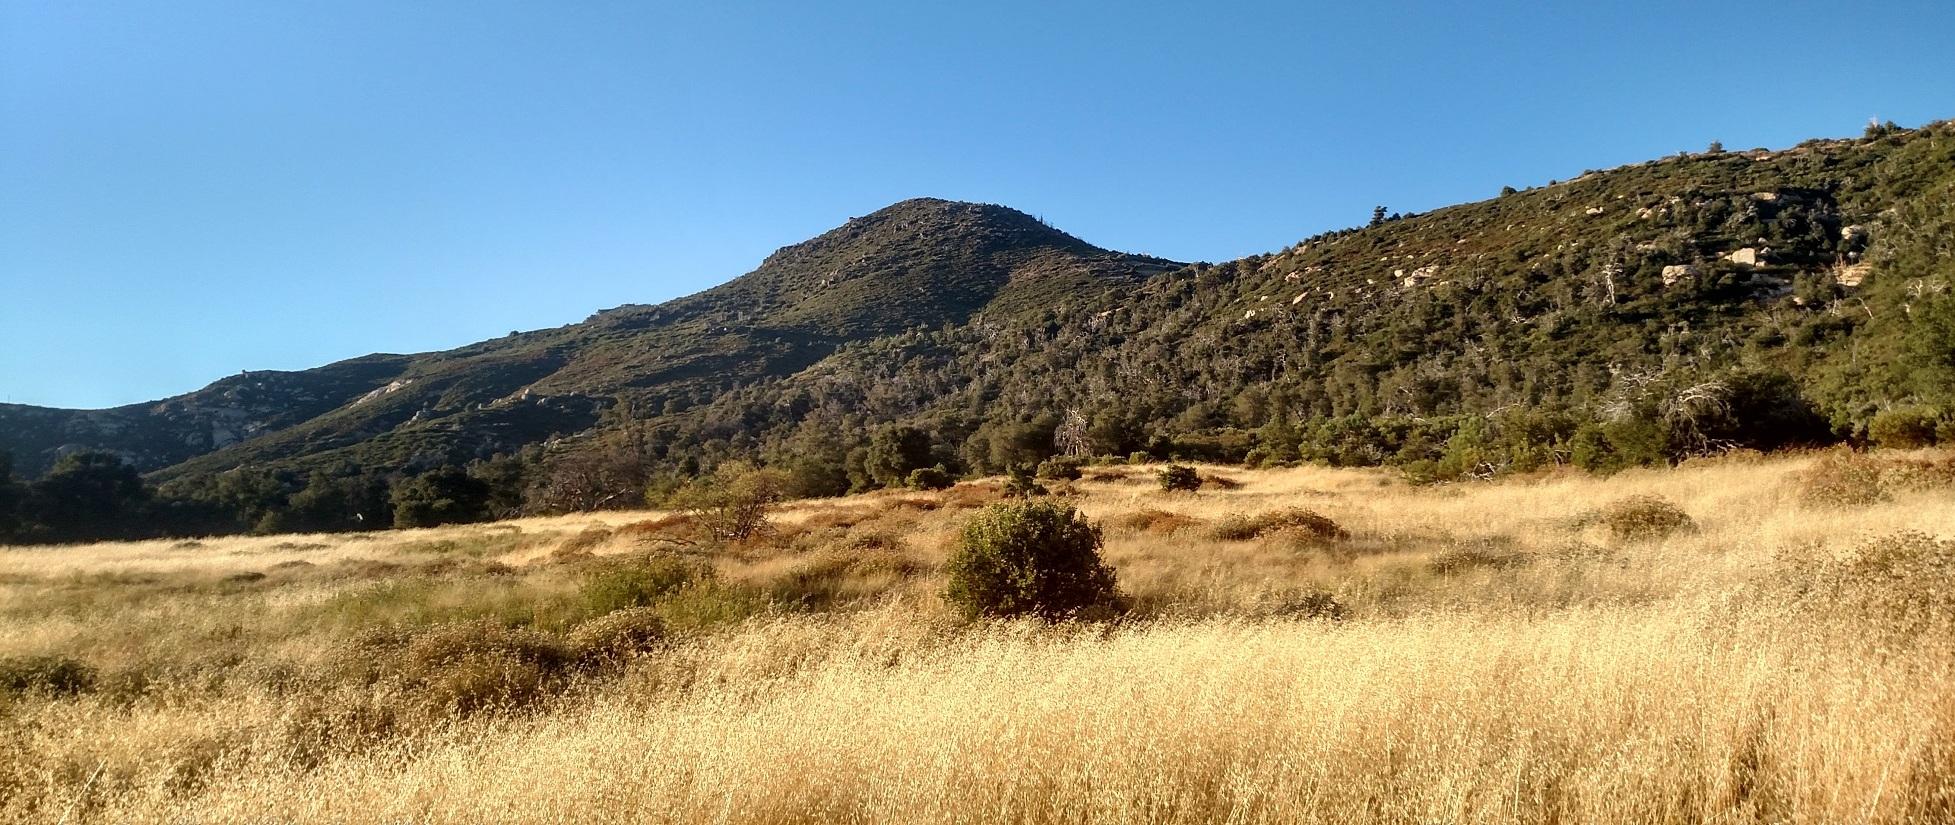 Cuyamaca Peak, Cuyamaca Rancho State Park